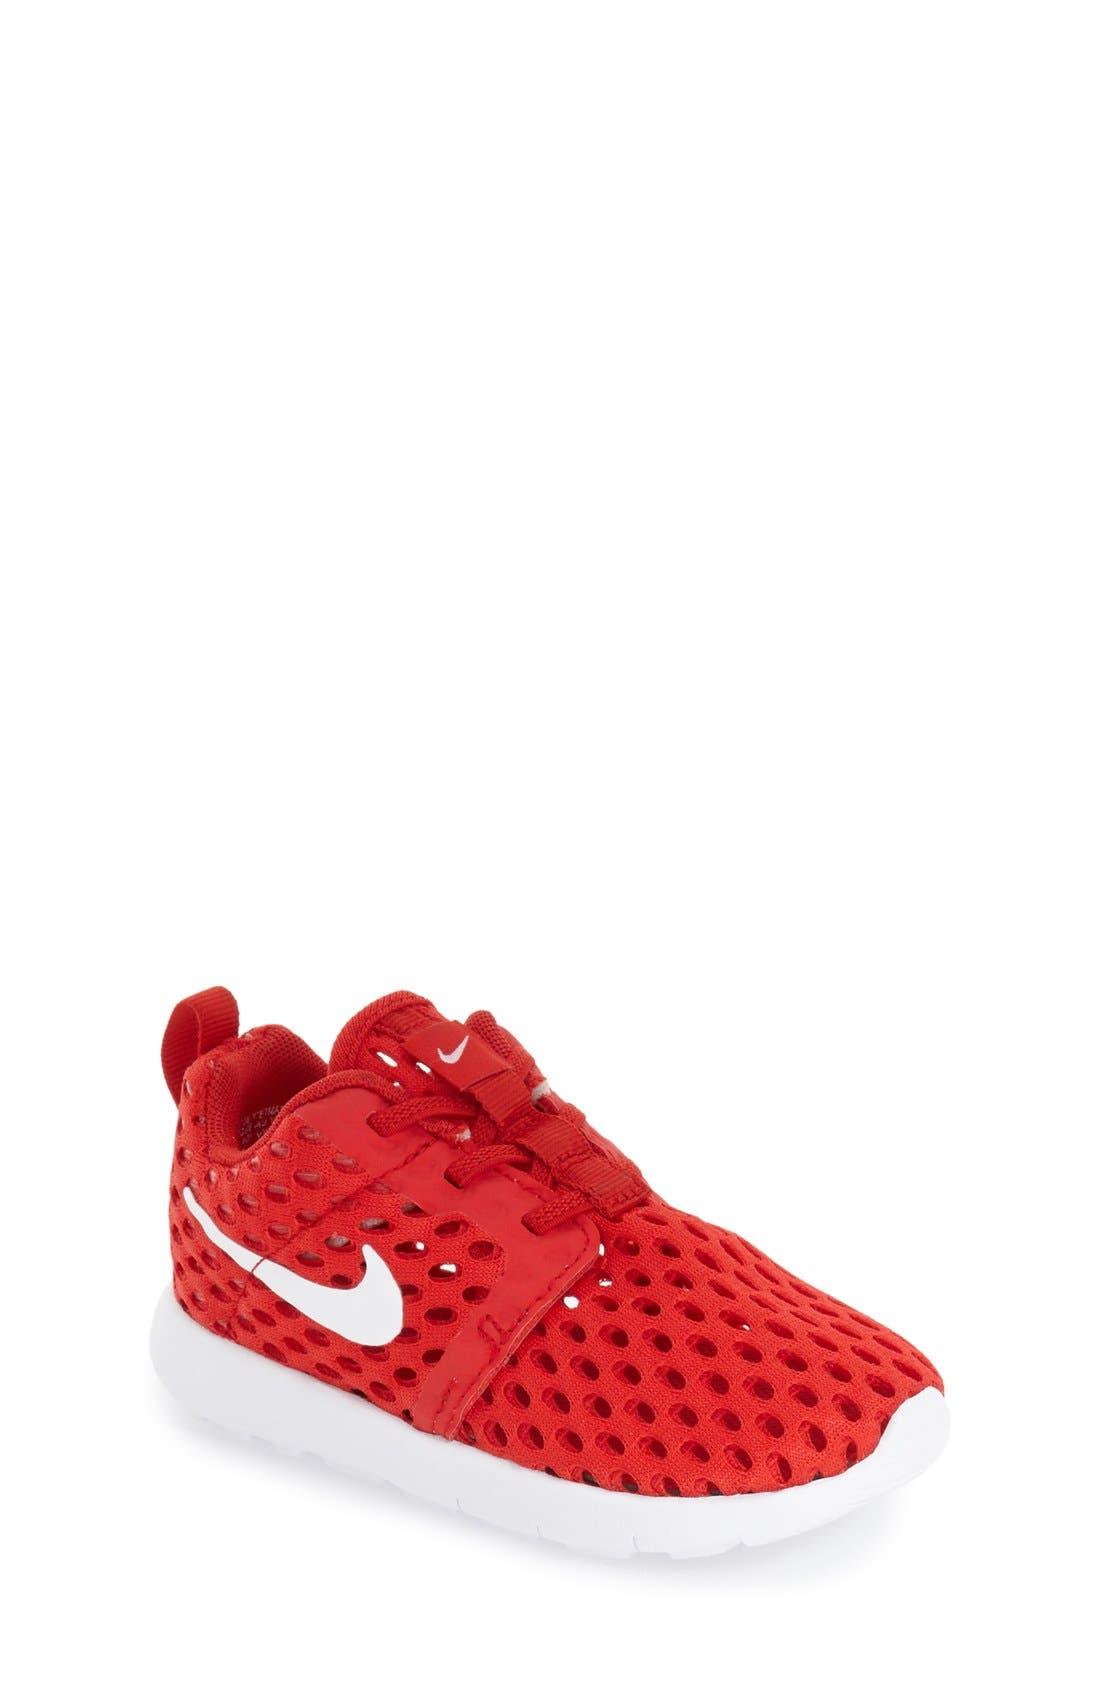 Main Image - Nike 'Roshe One Flight Weight' Sneaker (Baby, Walker &